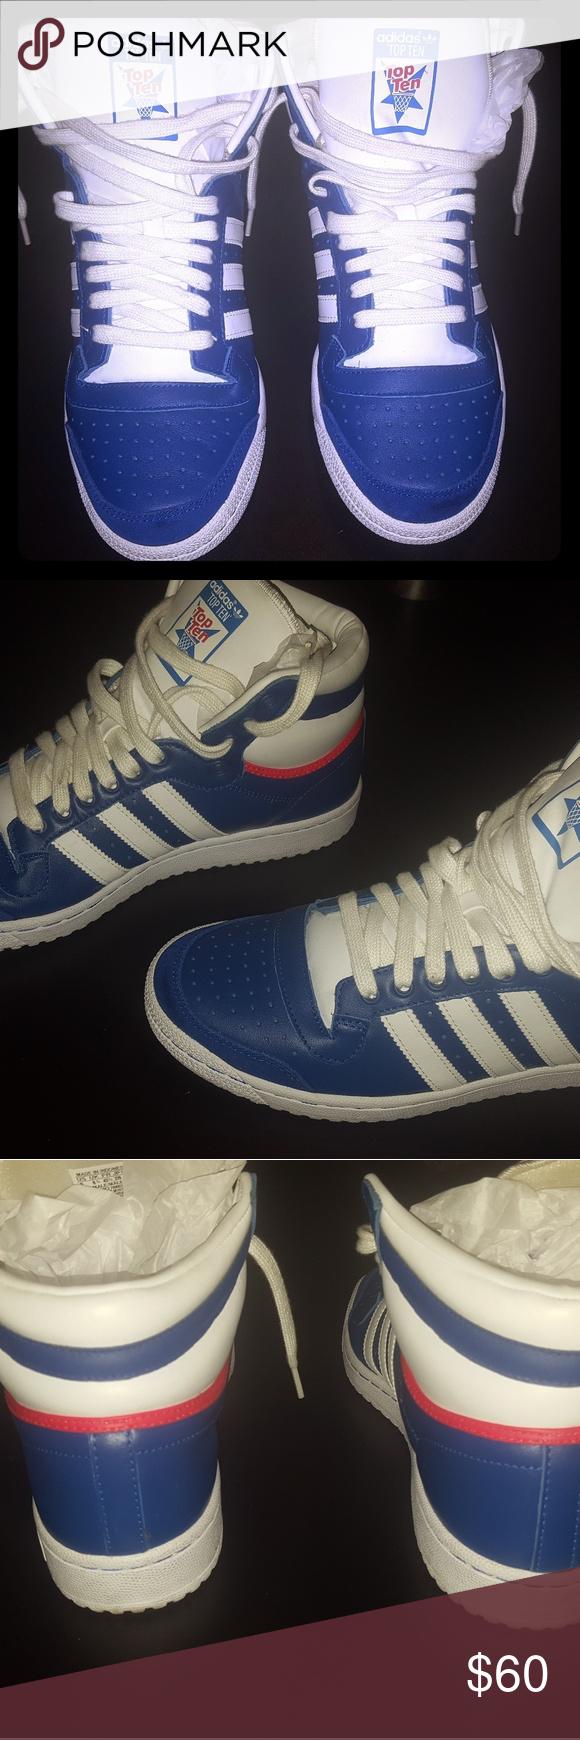 121cdda1 Adidas